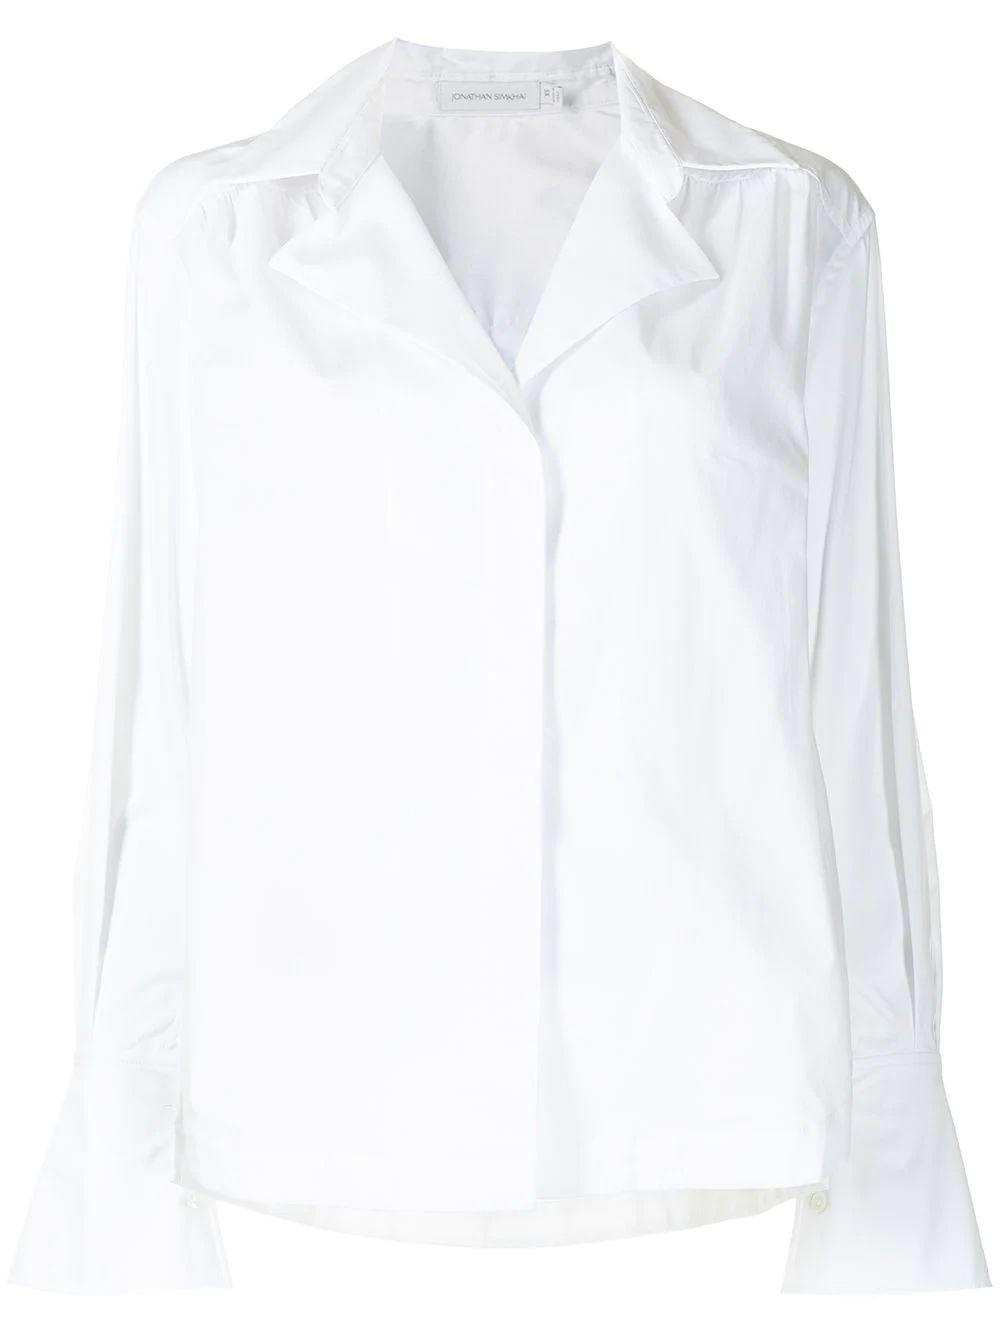 Evette Poplin Shirt Item # 221-2038-T